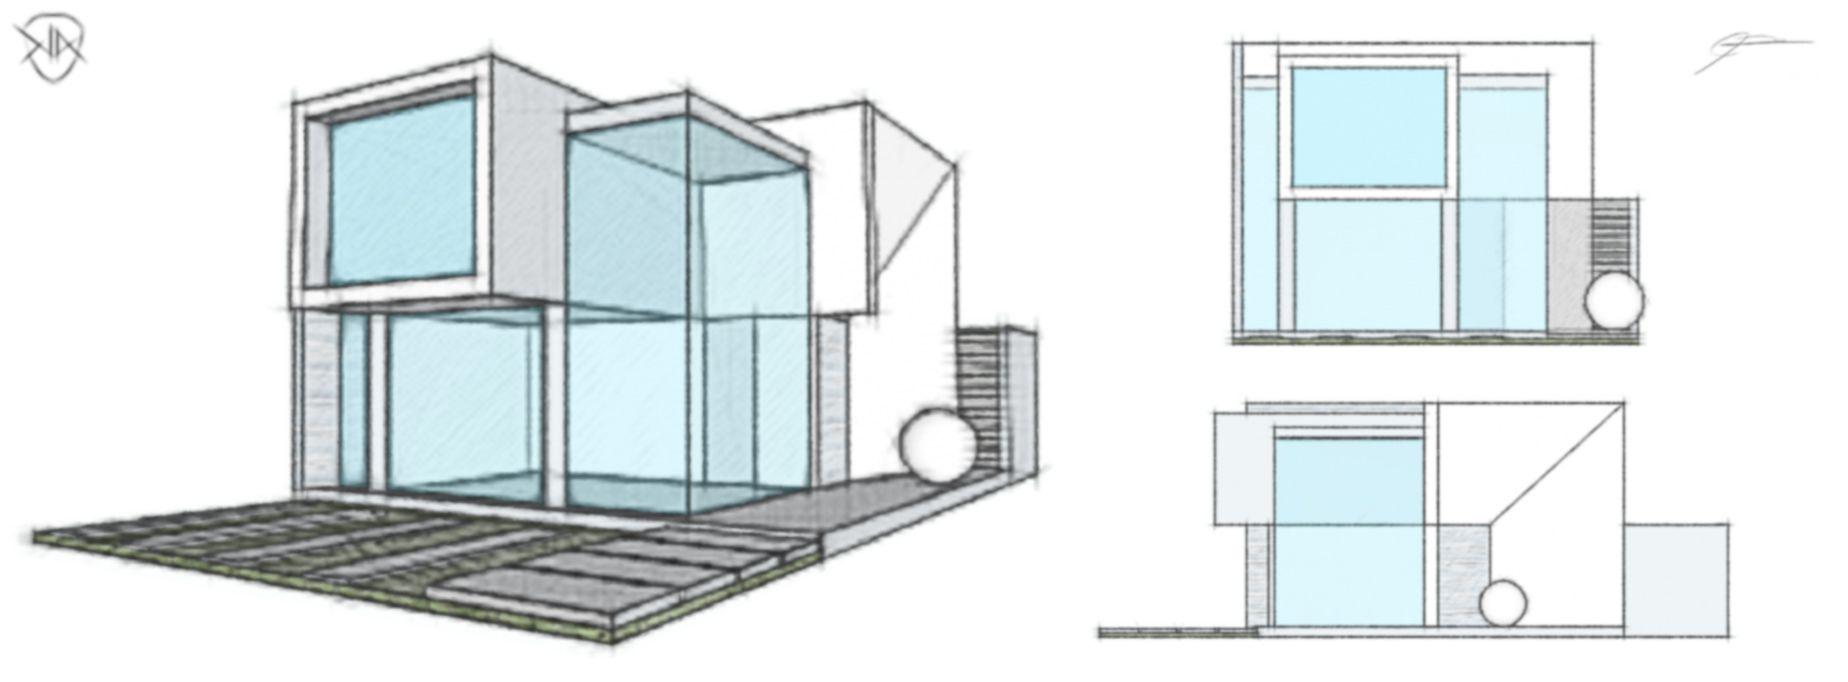 RSI P House Conceptual